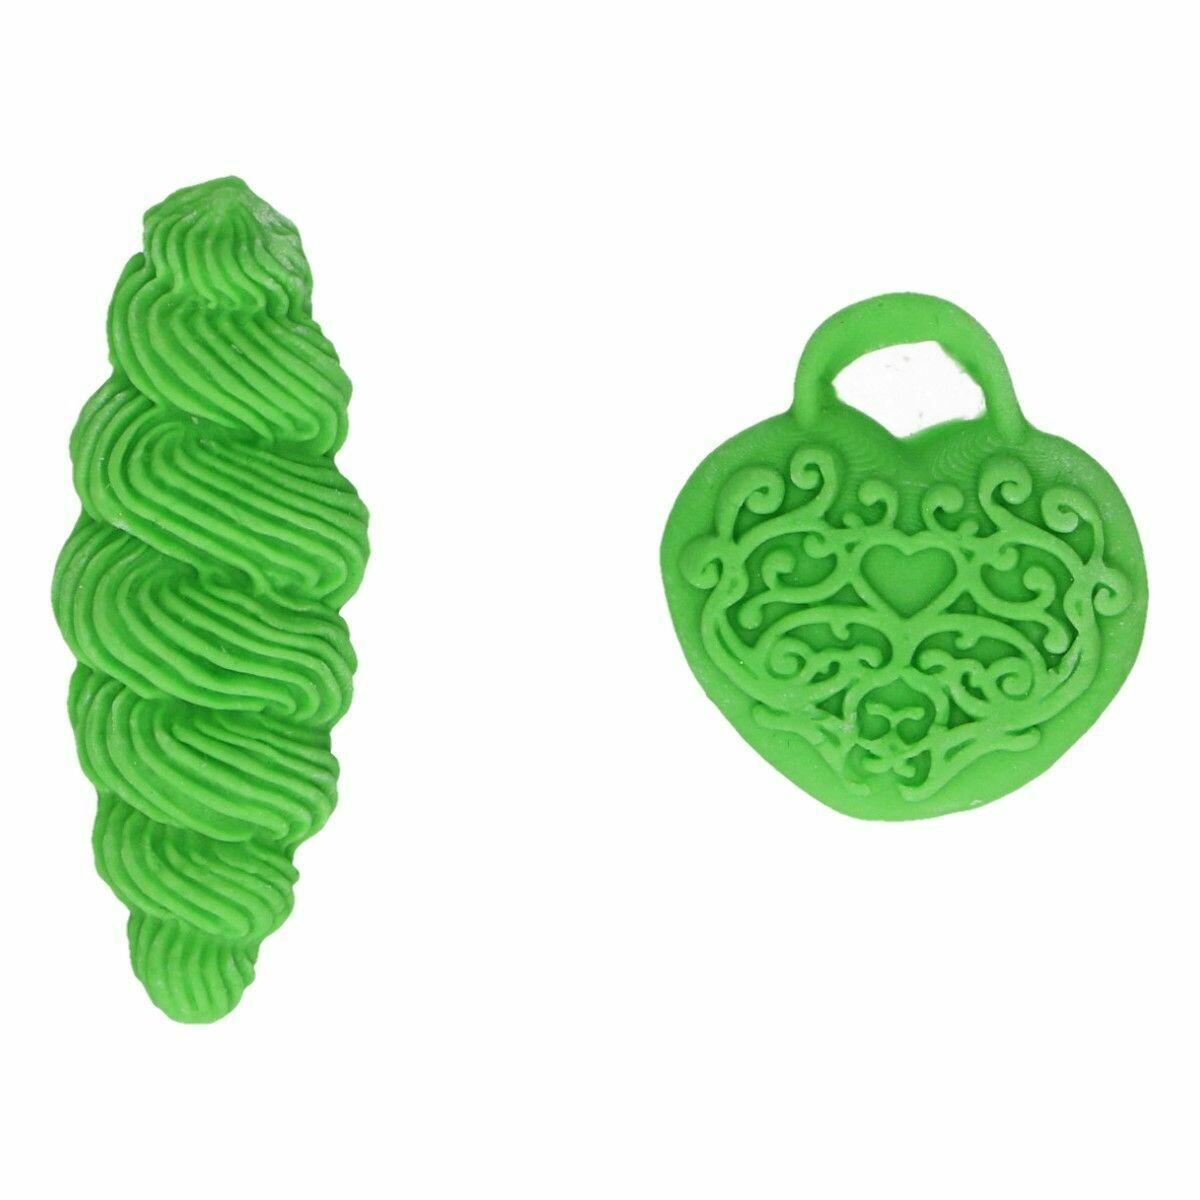 FunCakes FunColours GEL -BRIGHT GREEN -Χρώμα Πάστας -Λαμπερό πράσινο 30γρ